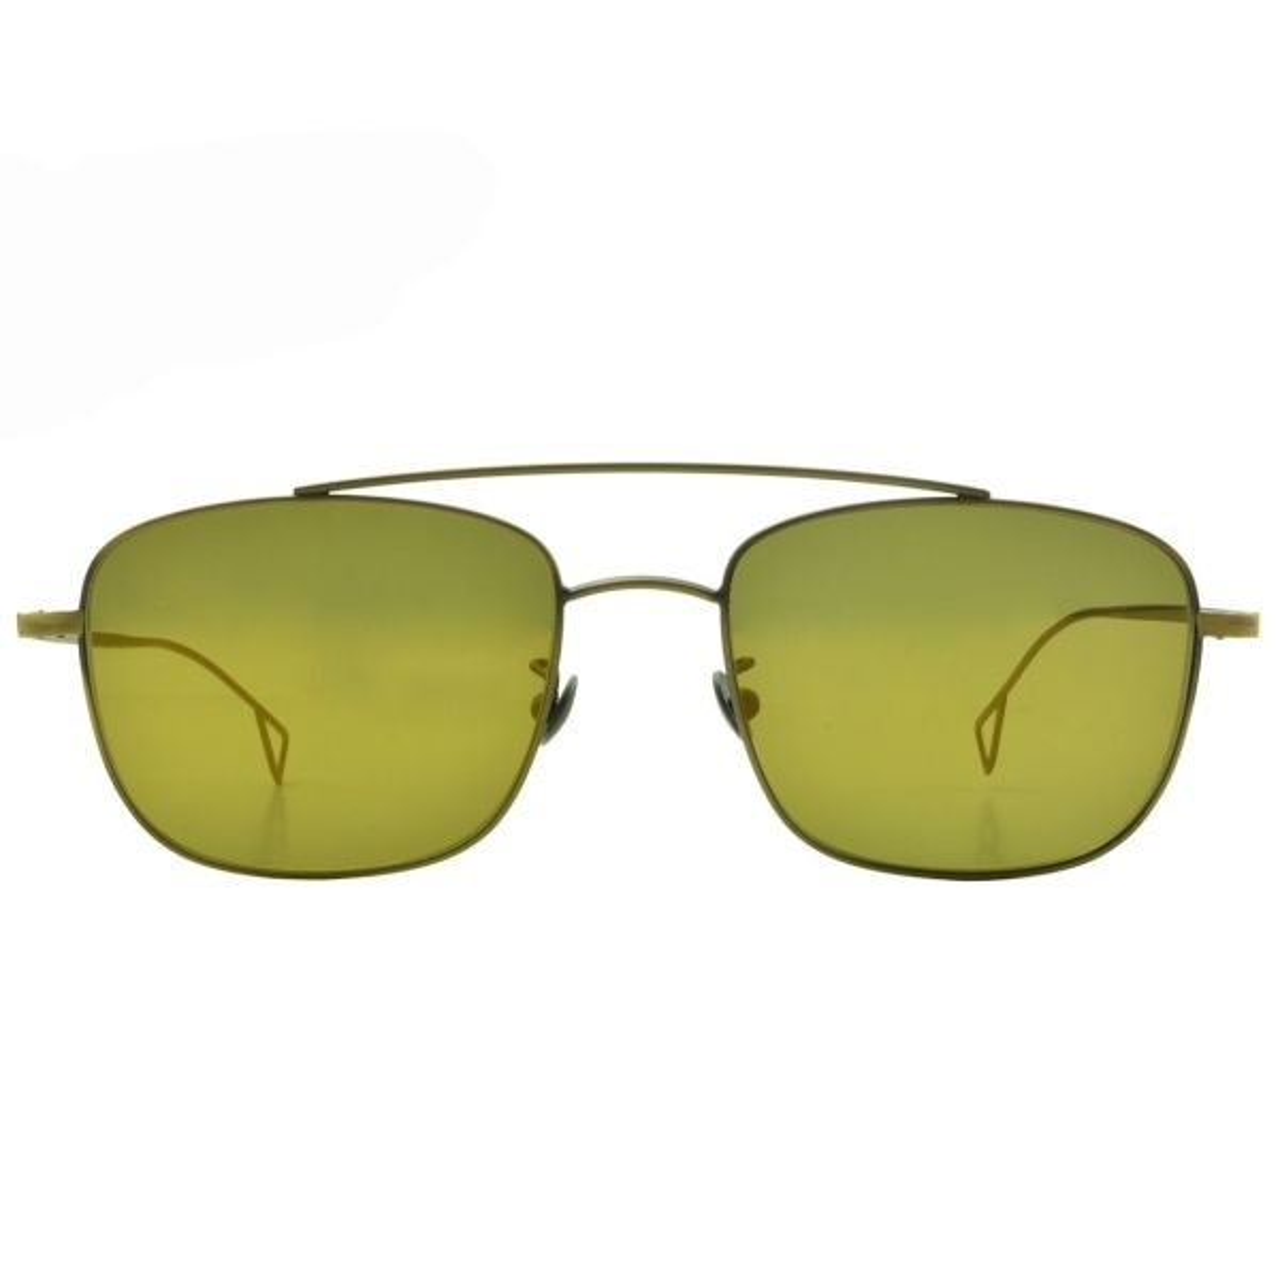 عینک آفتابی Nik03 سری Sun مدل Nk555 1ks